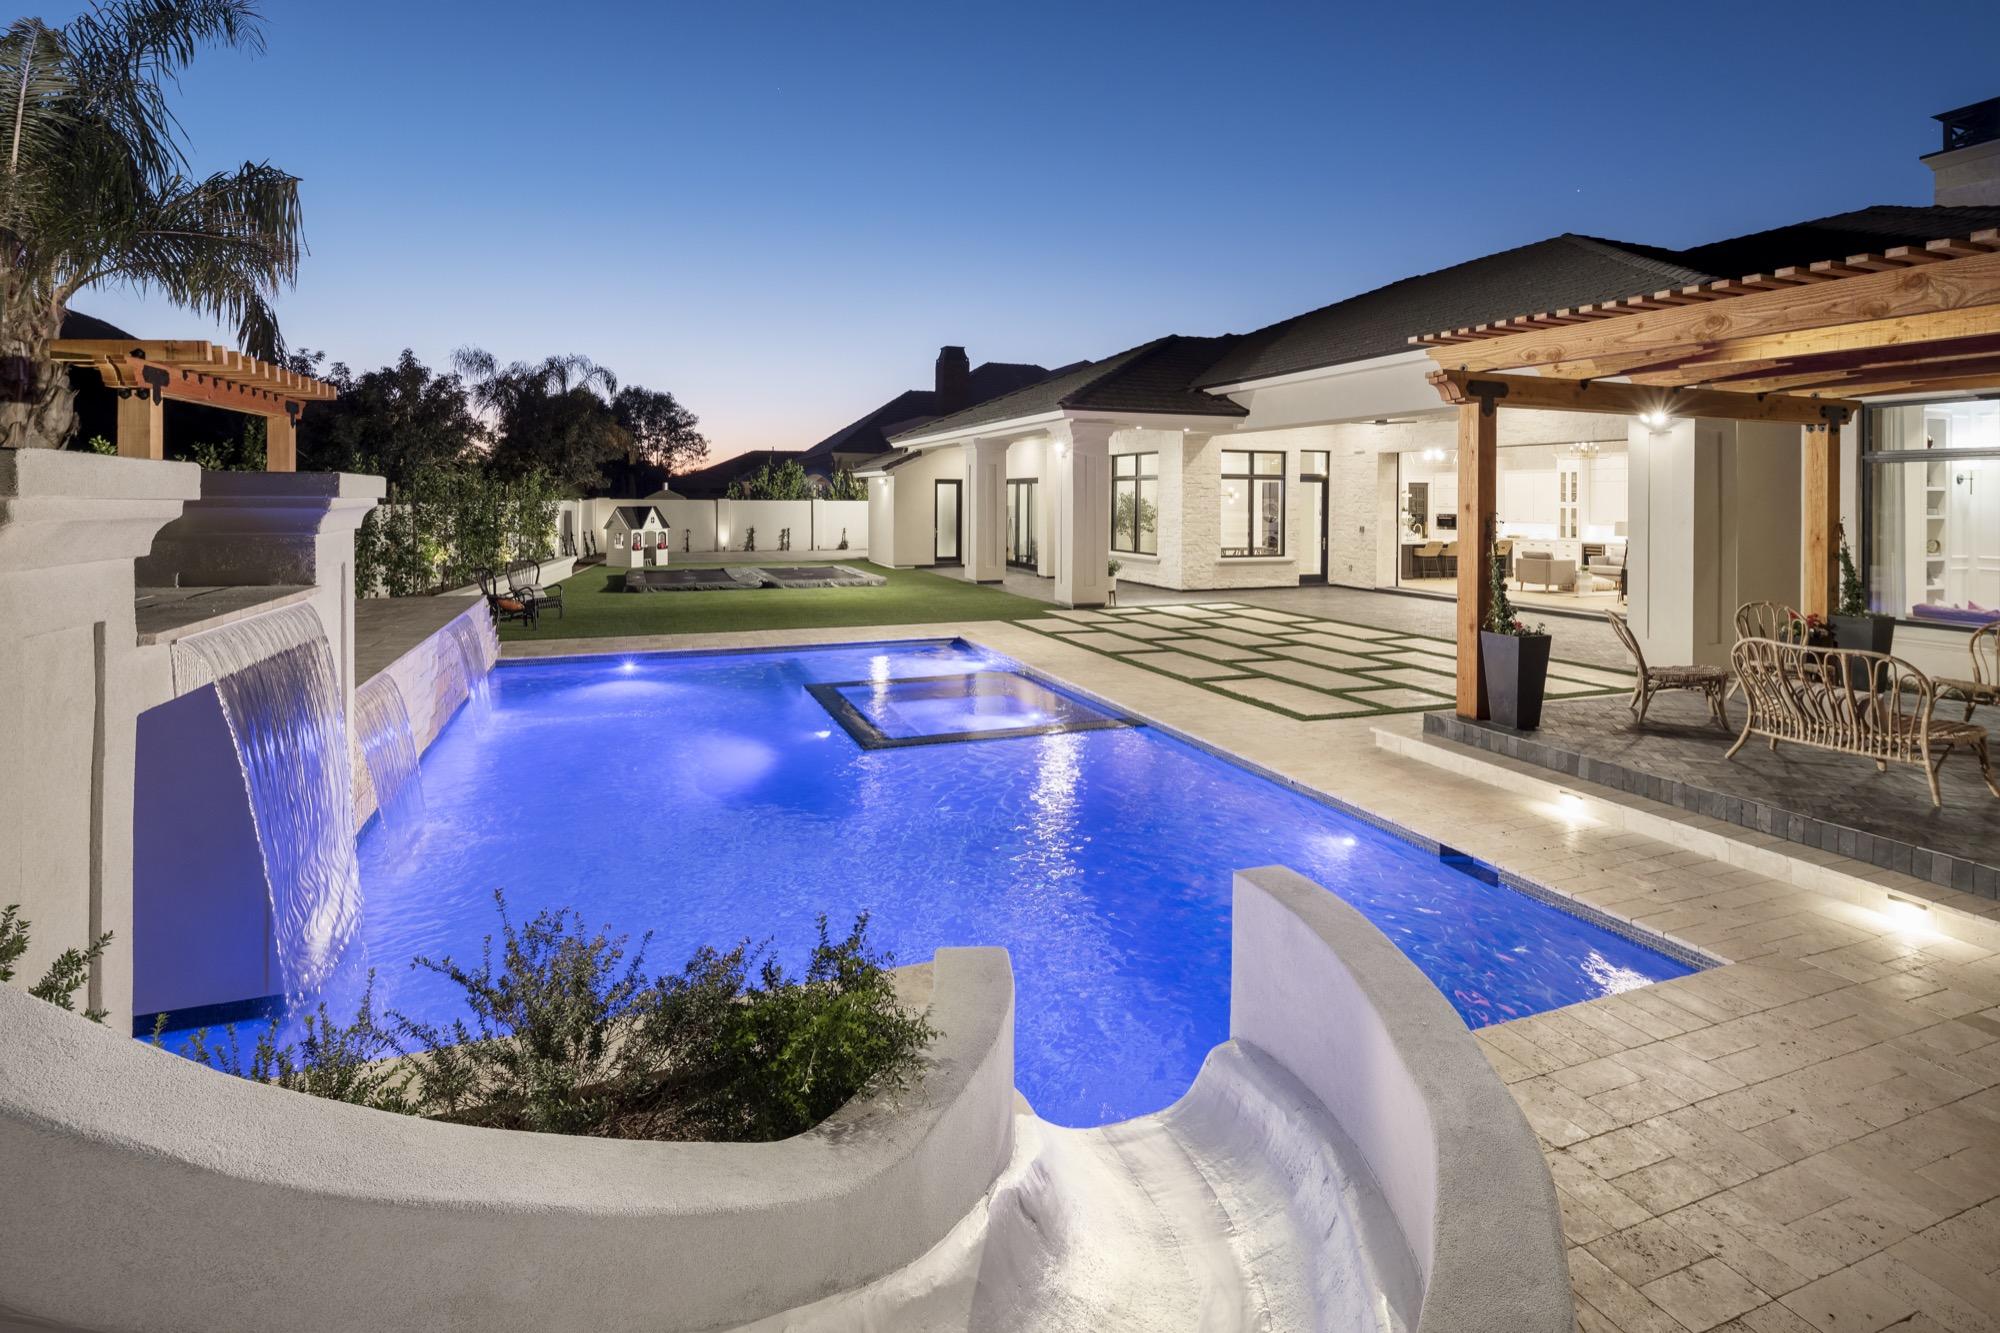 Making Your Backyard a Sanctuary